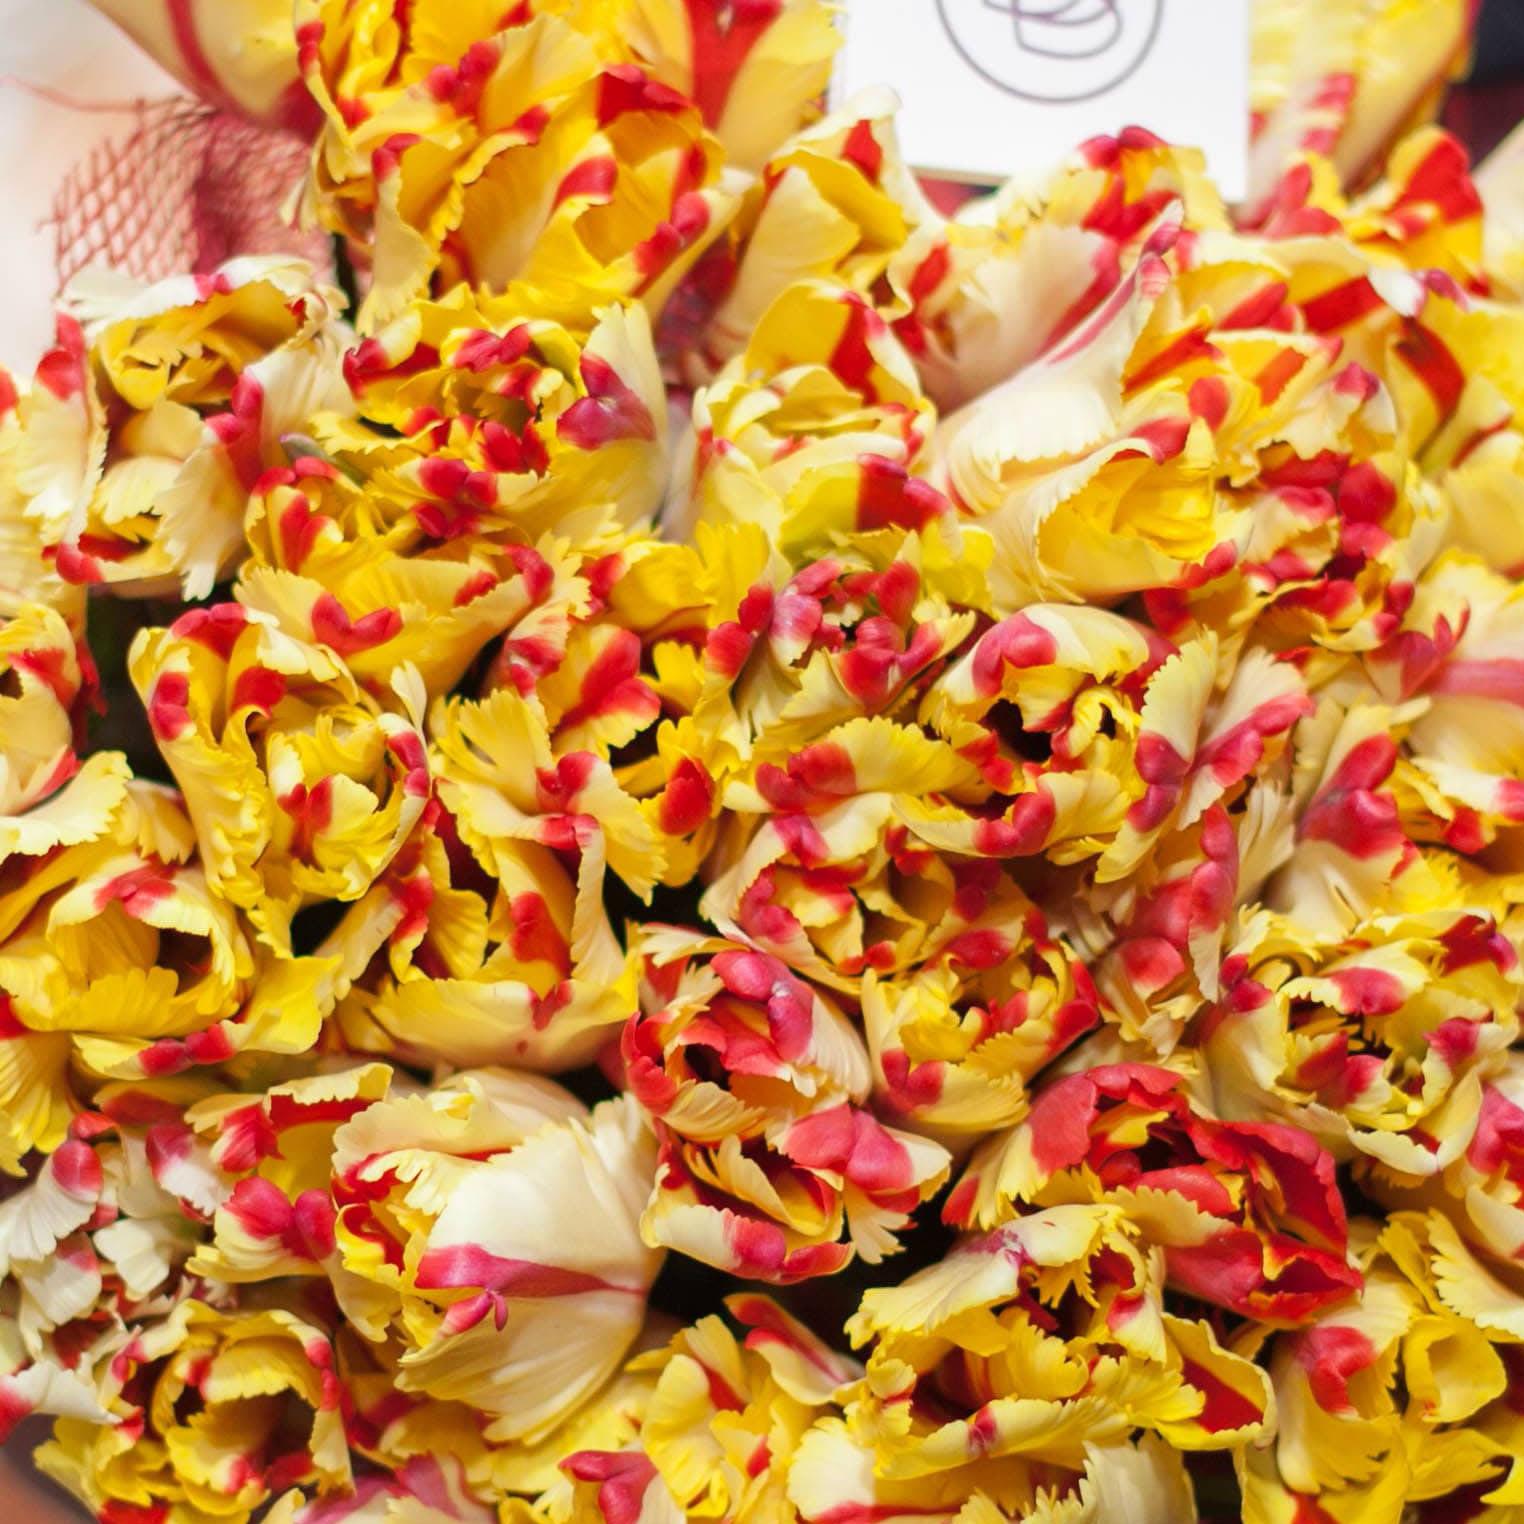 Попугайчатые желто-красные тюльпаны